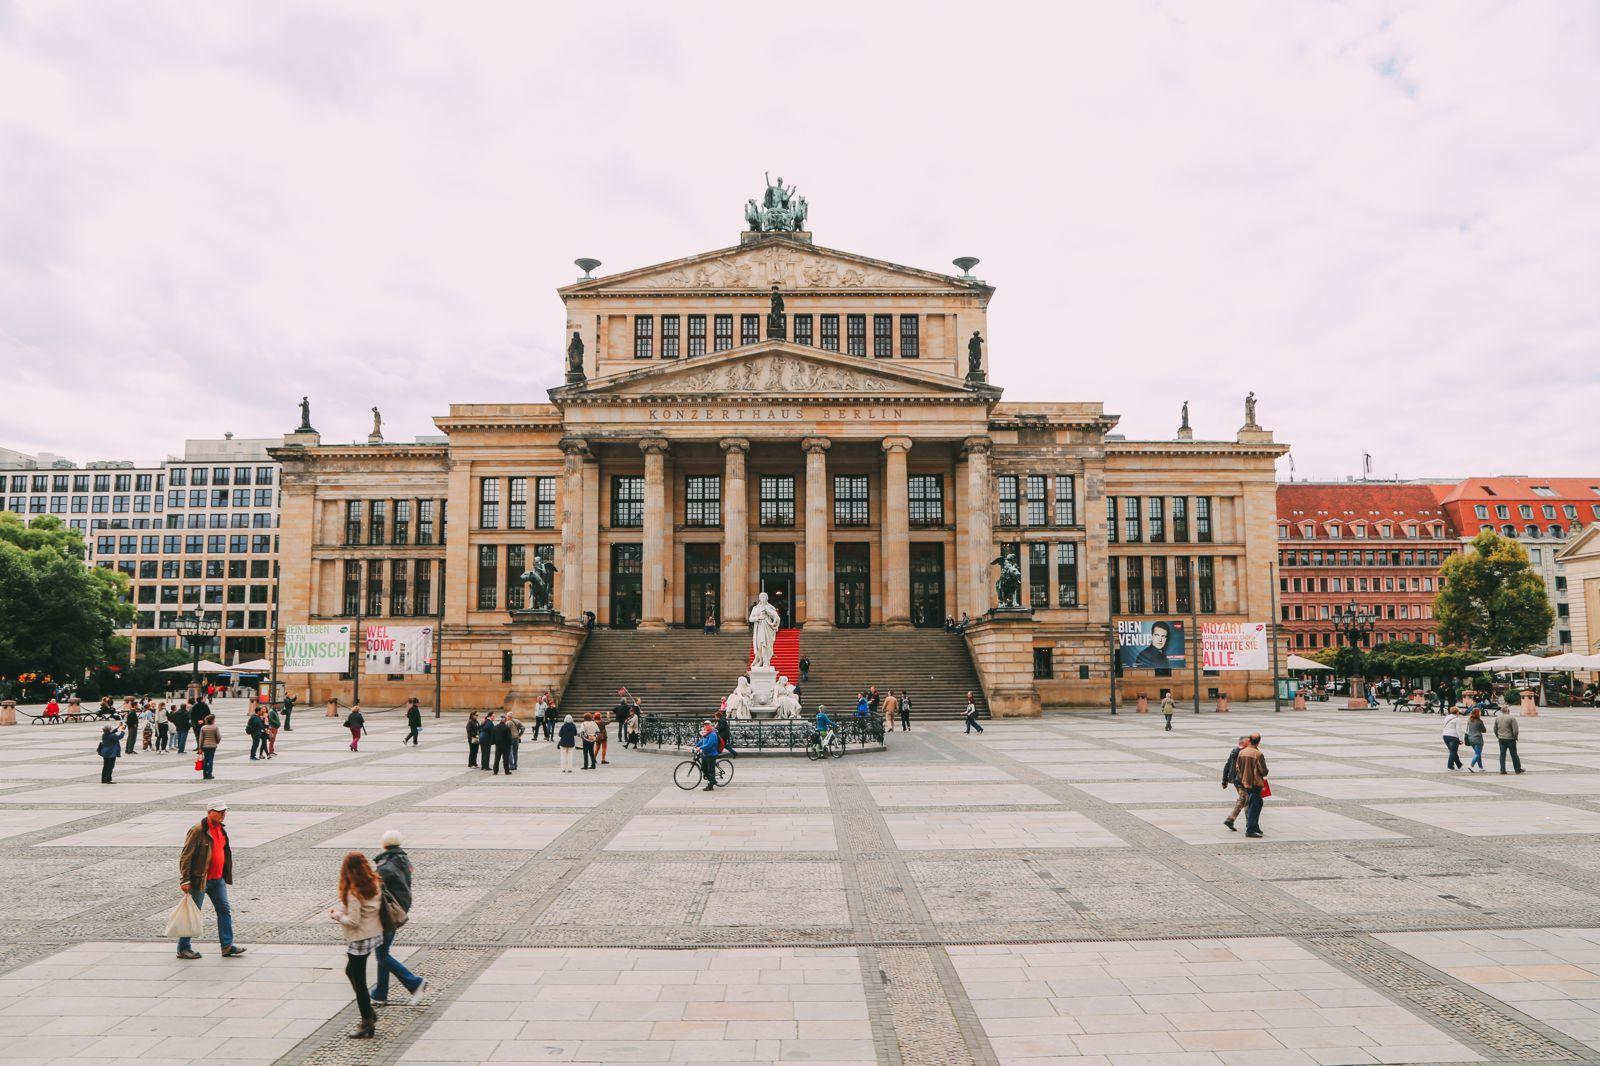 Sightseeing In Berlin, Germany - Part 2 (2)